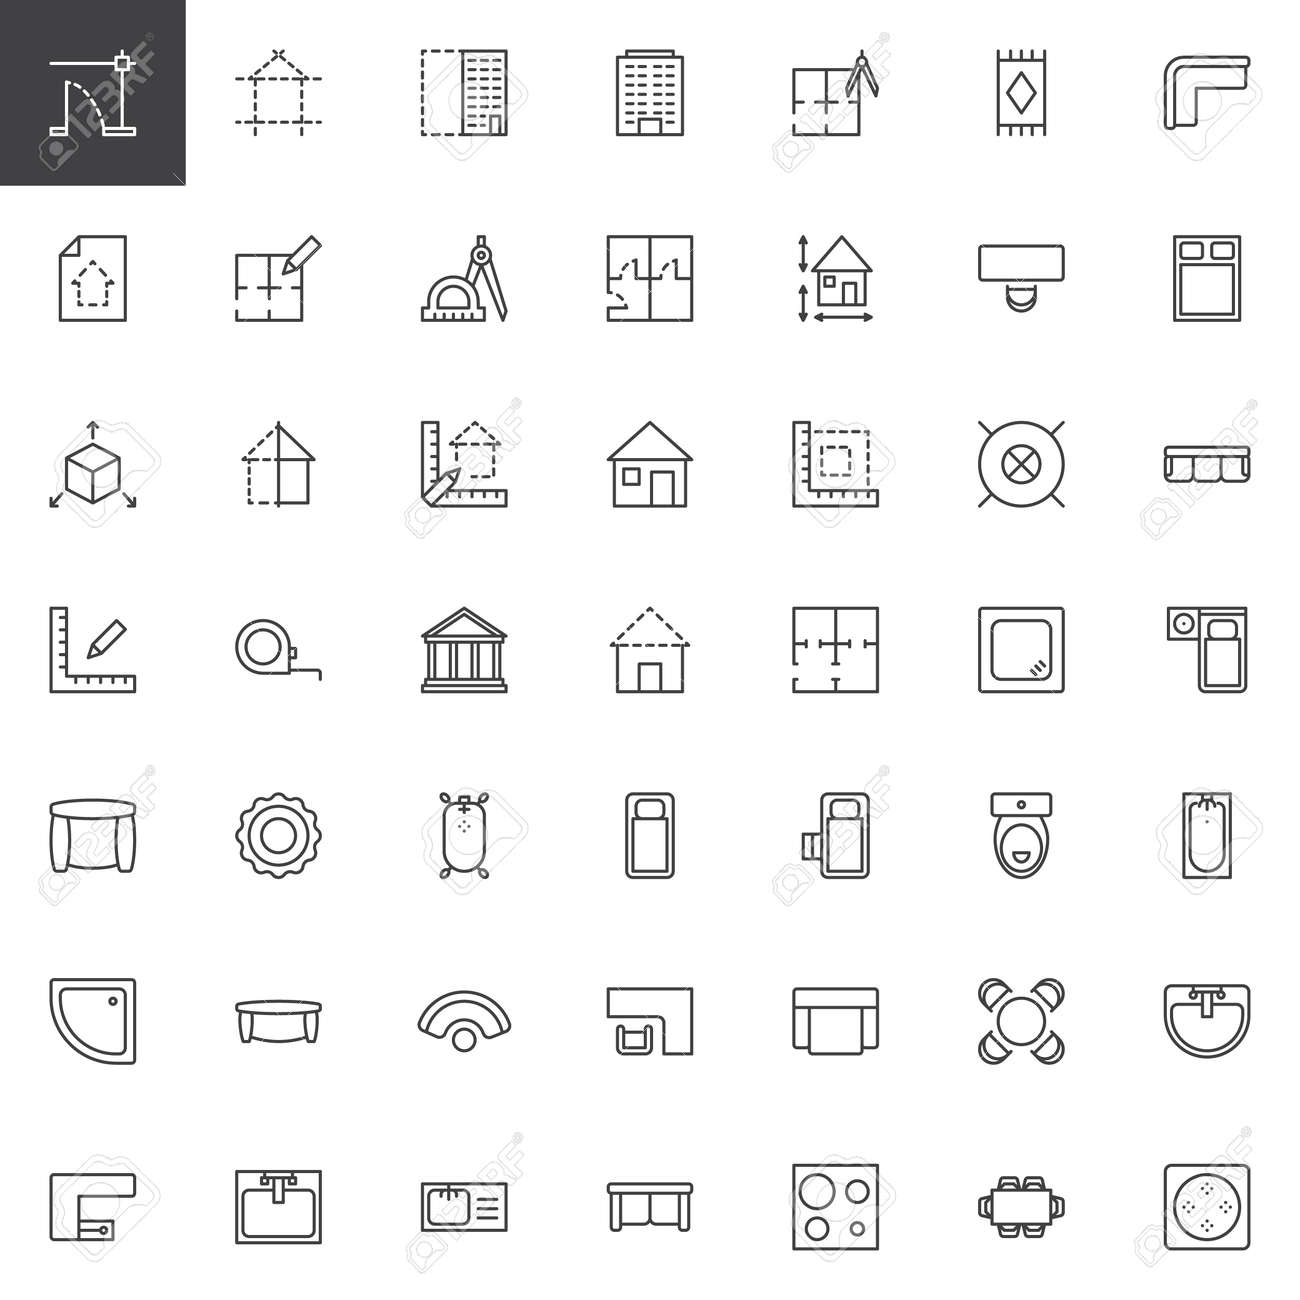 Architecture Elements Outline Icons Set Linear Style Symbols